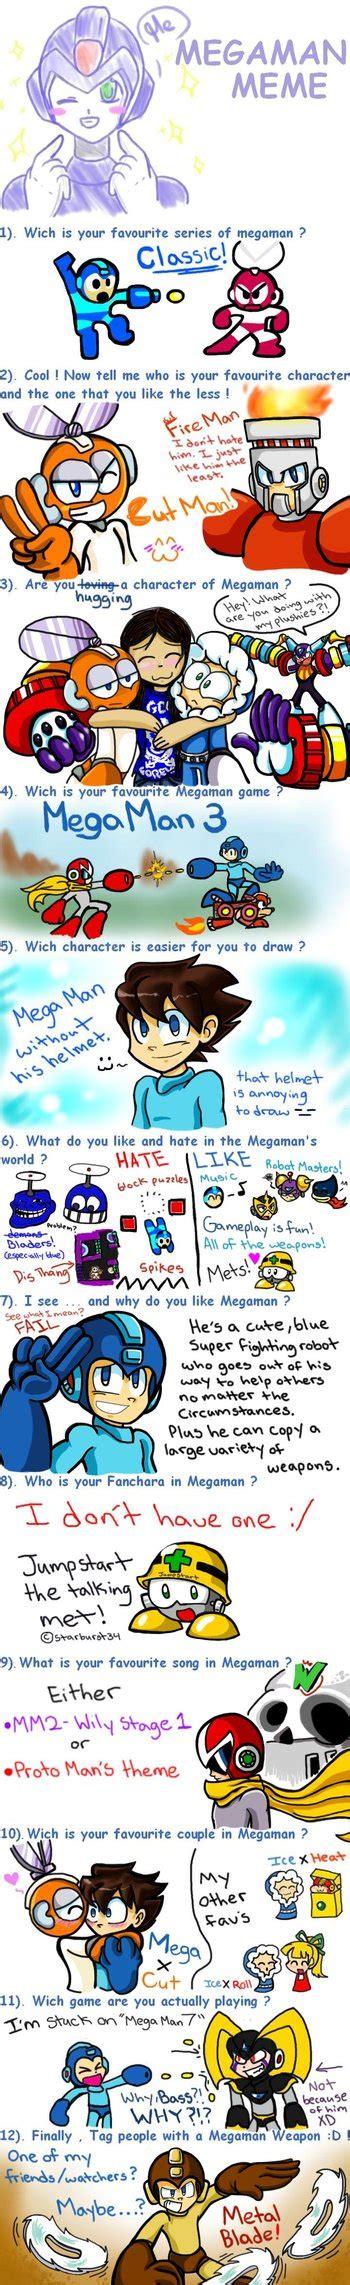 Megaman Memes - mega man meme by 8 bit britt on deviantart